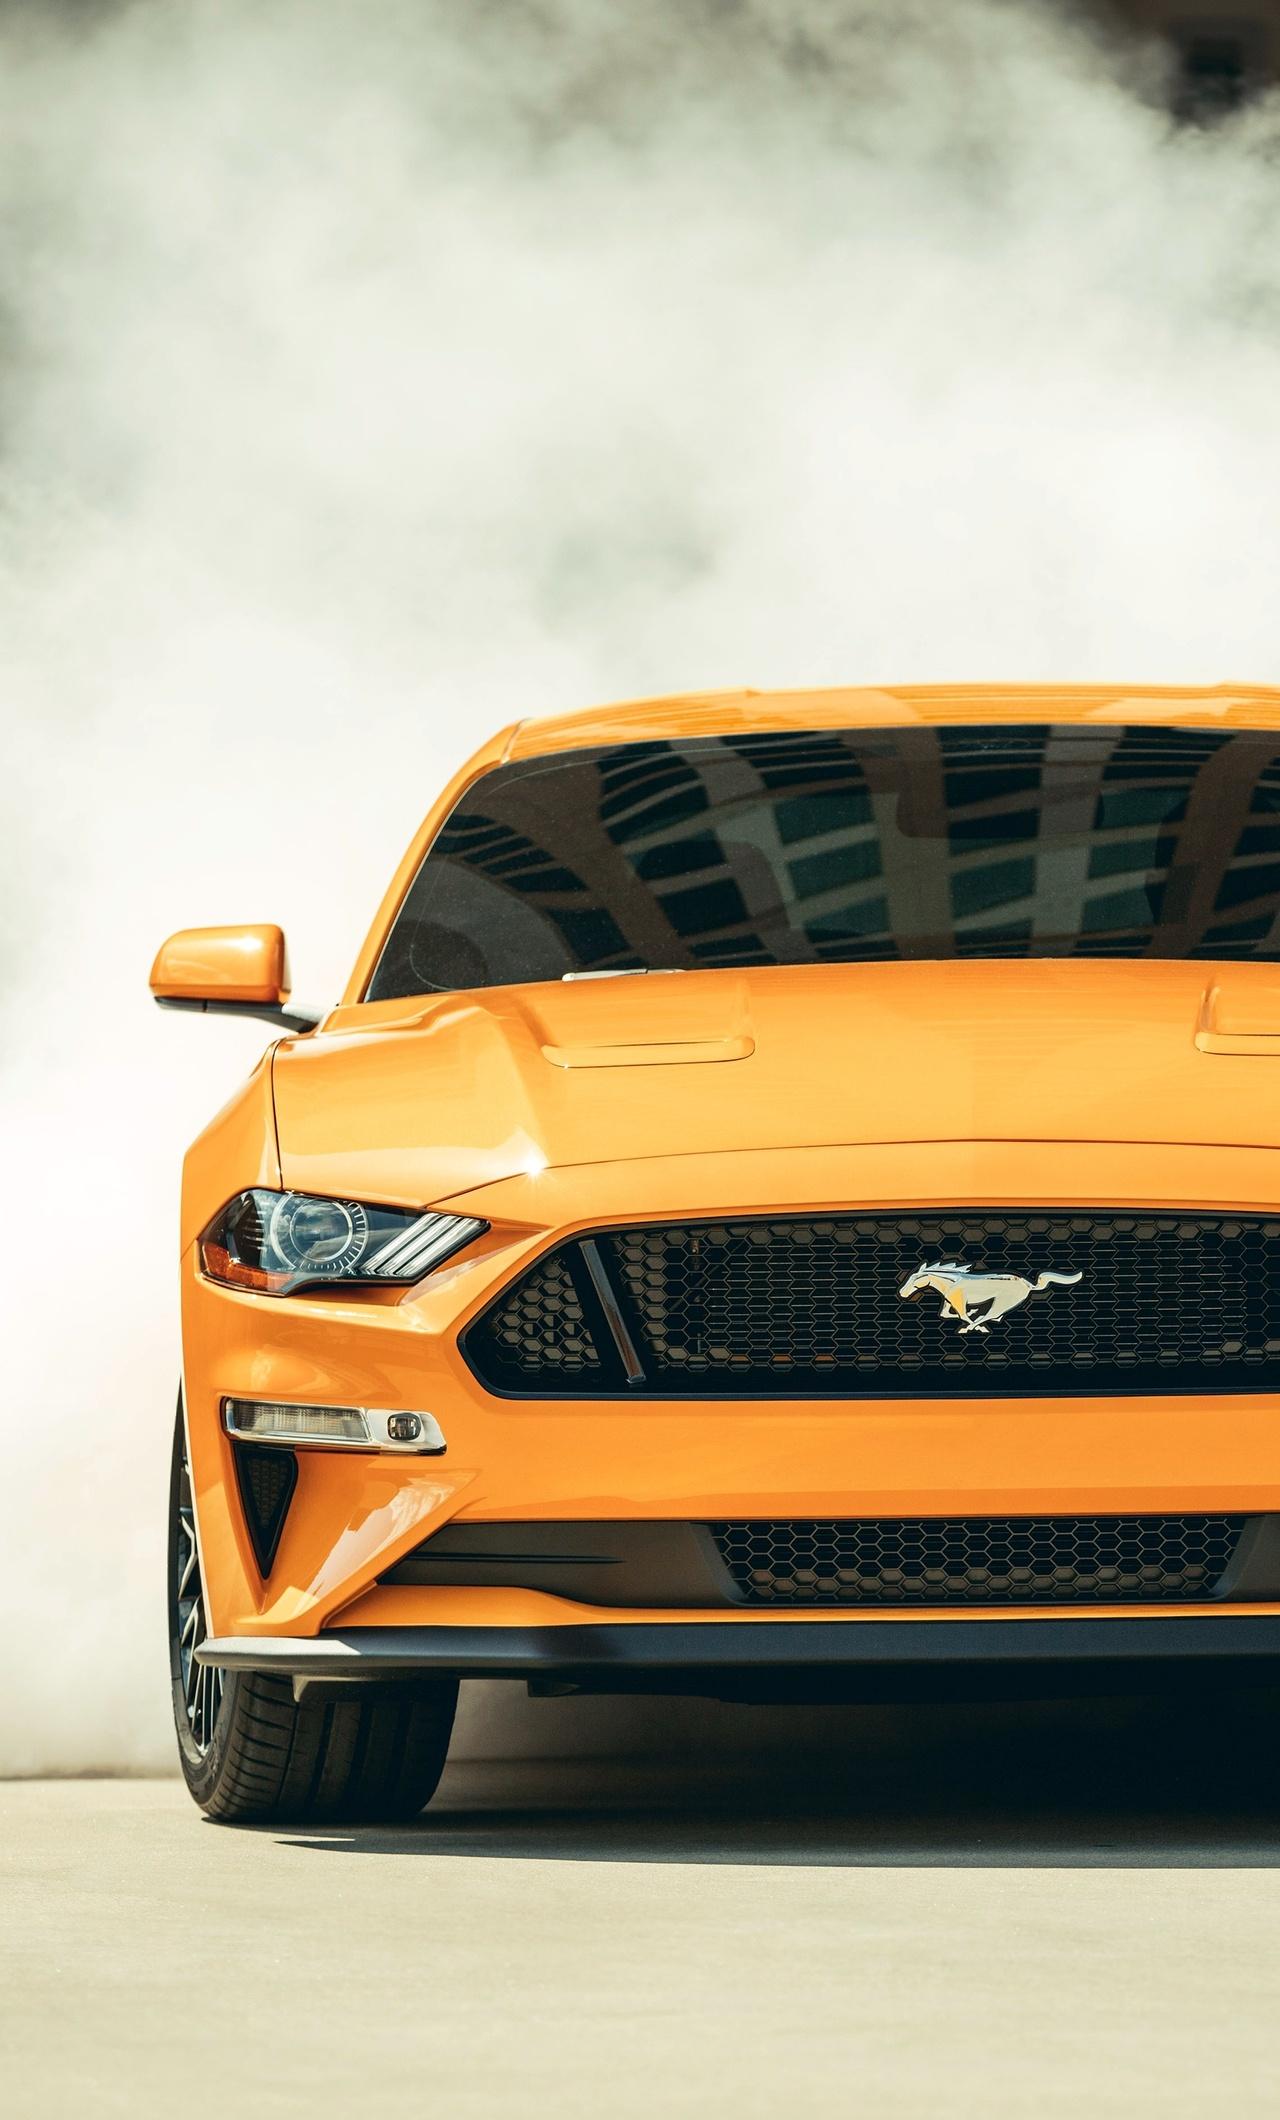 Ford Mustang Iphone Wallpaper Hd Impremedia Net